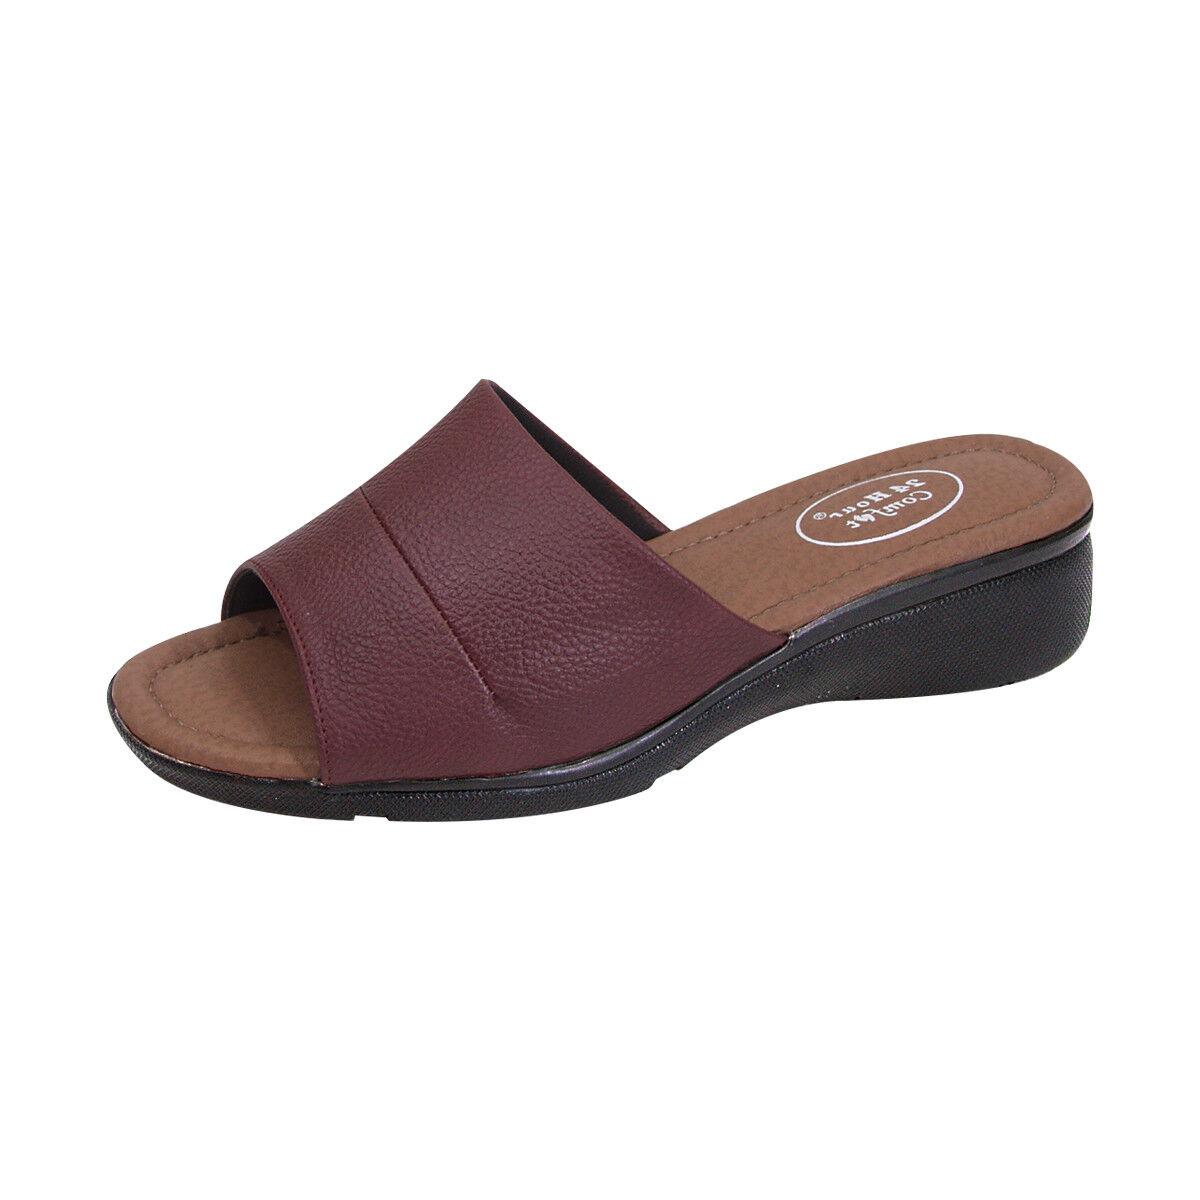 24 Hour Comfort Stacy Women Wide Width Synthetic Leather Open-Toe Slide Sandal